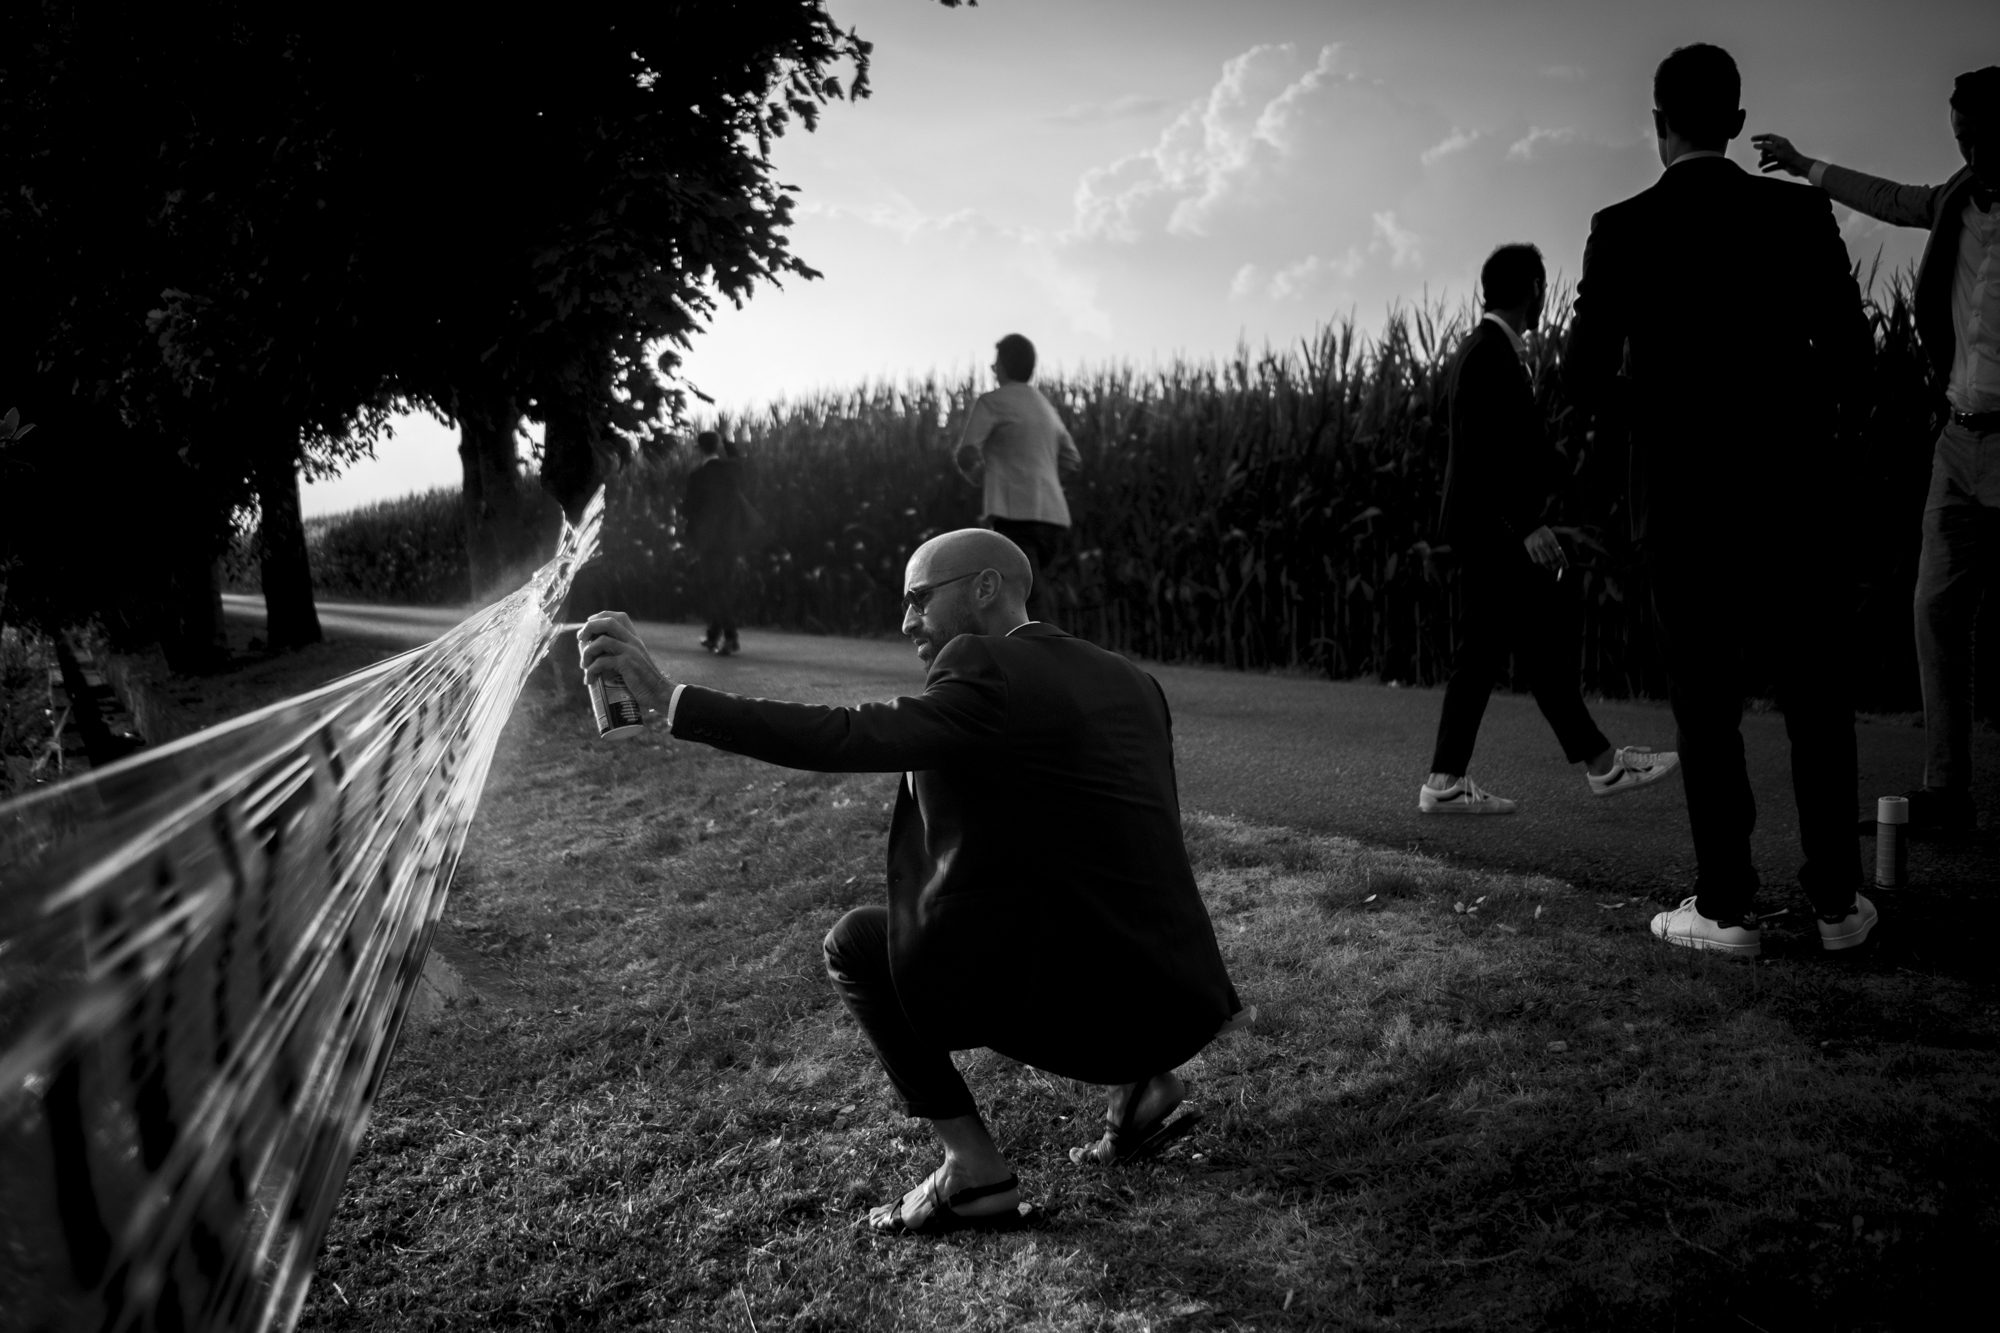 fotografo matrimonio Brescia Federico Rongaroli reportage di matrimonio wedding reportage